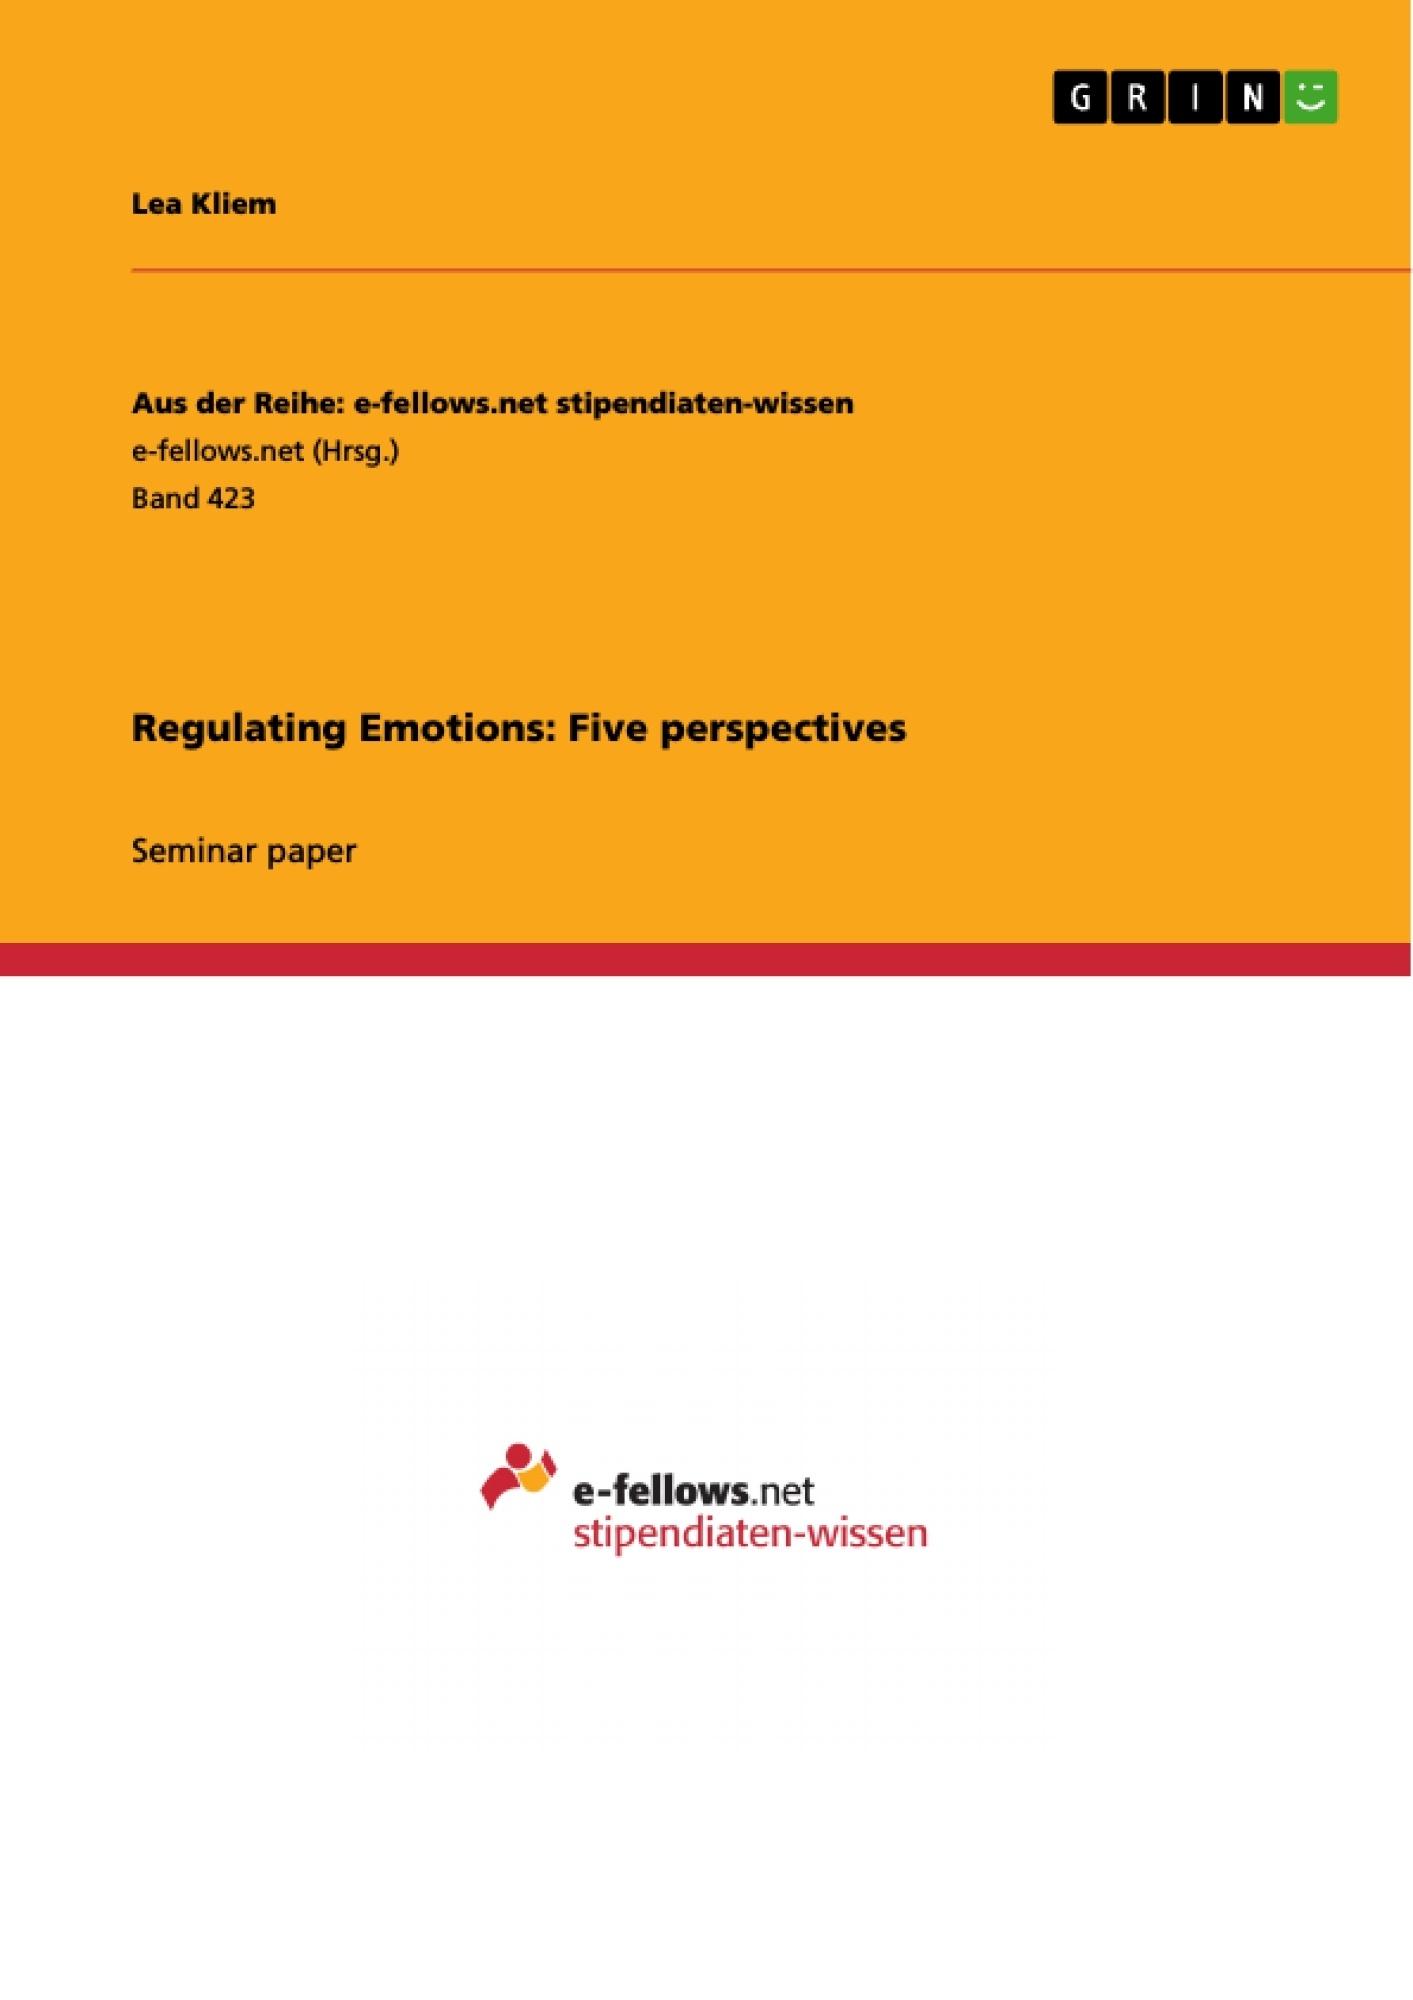 Title: Regulating Emotions: Five perspectives